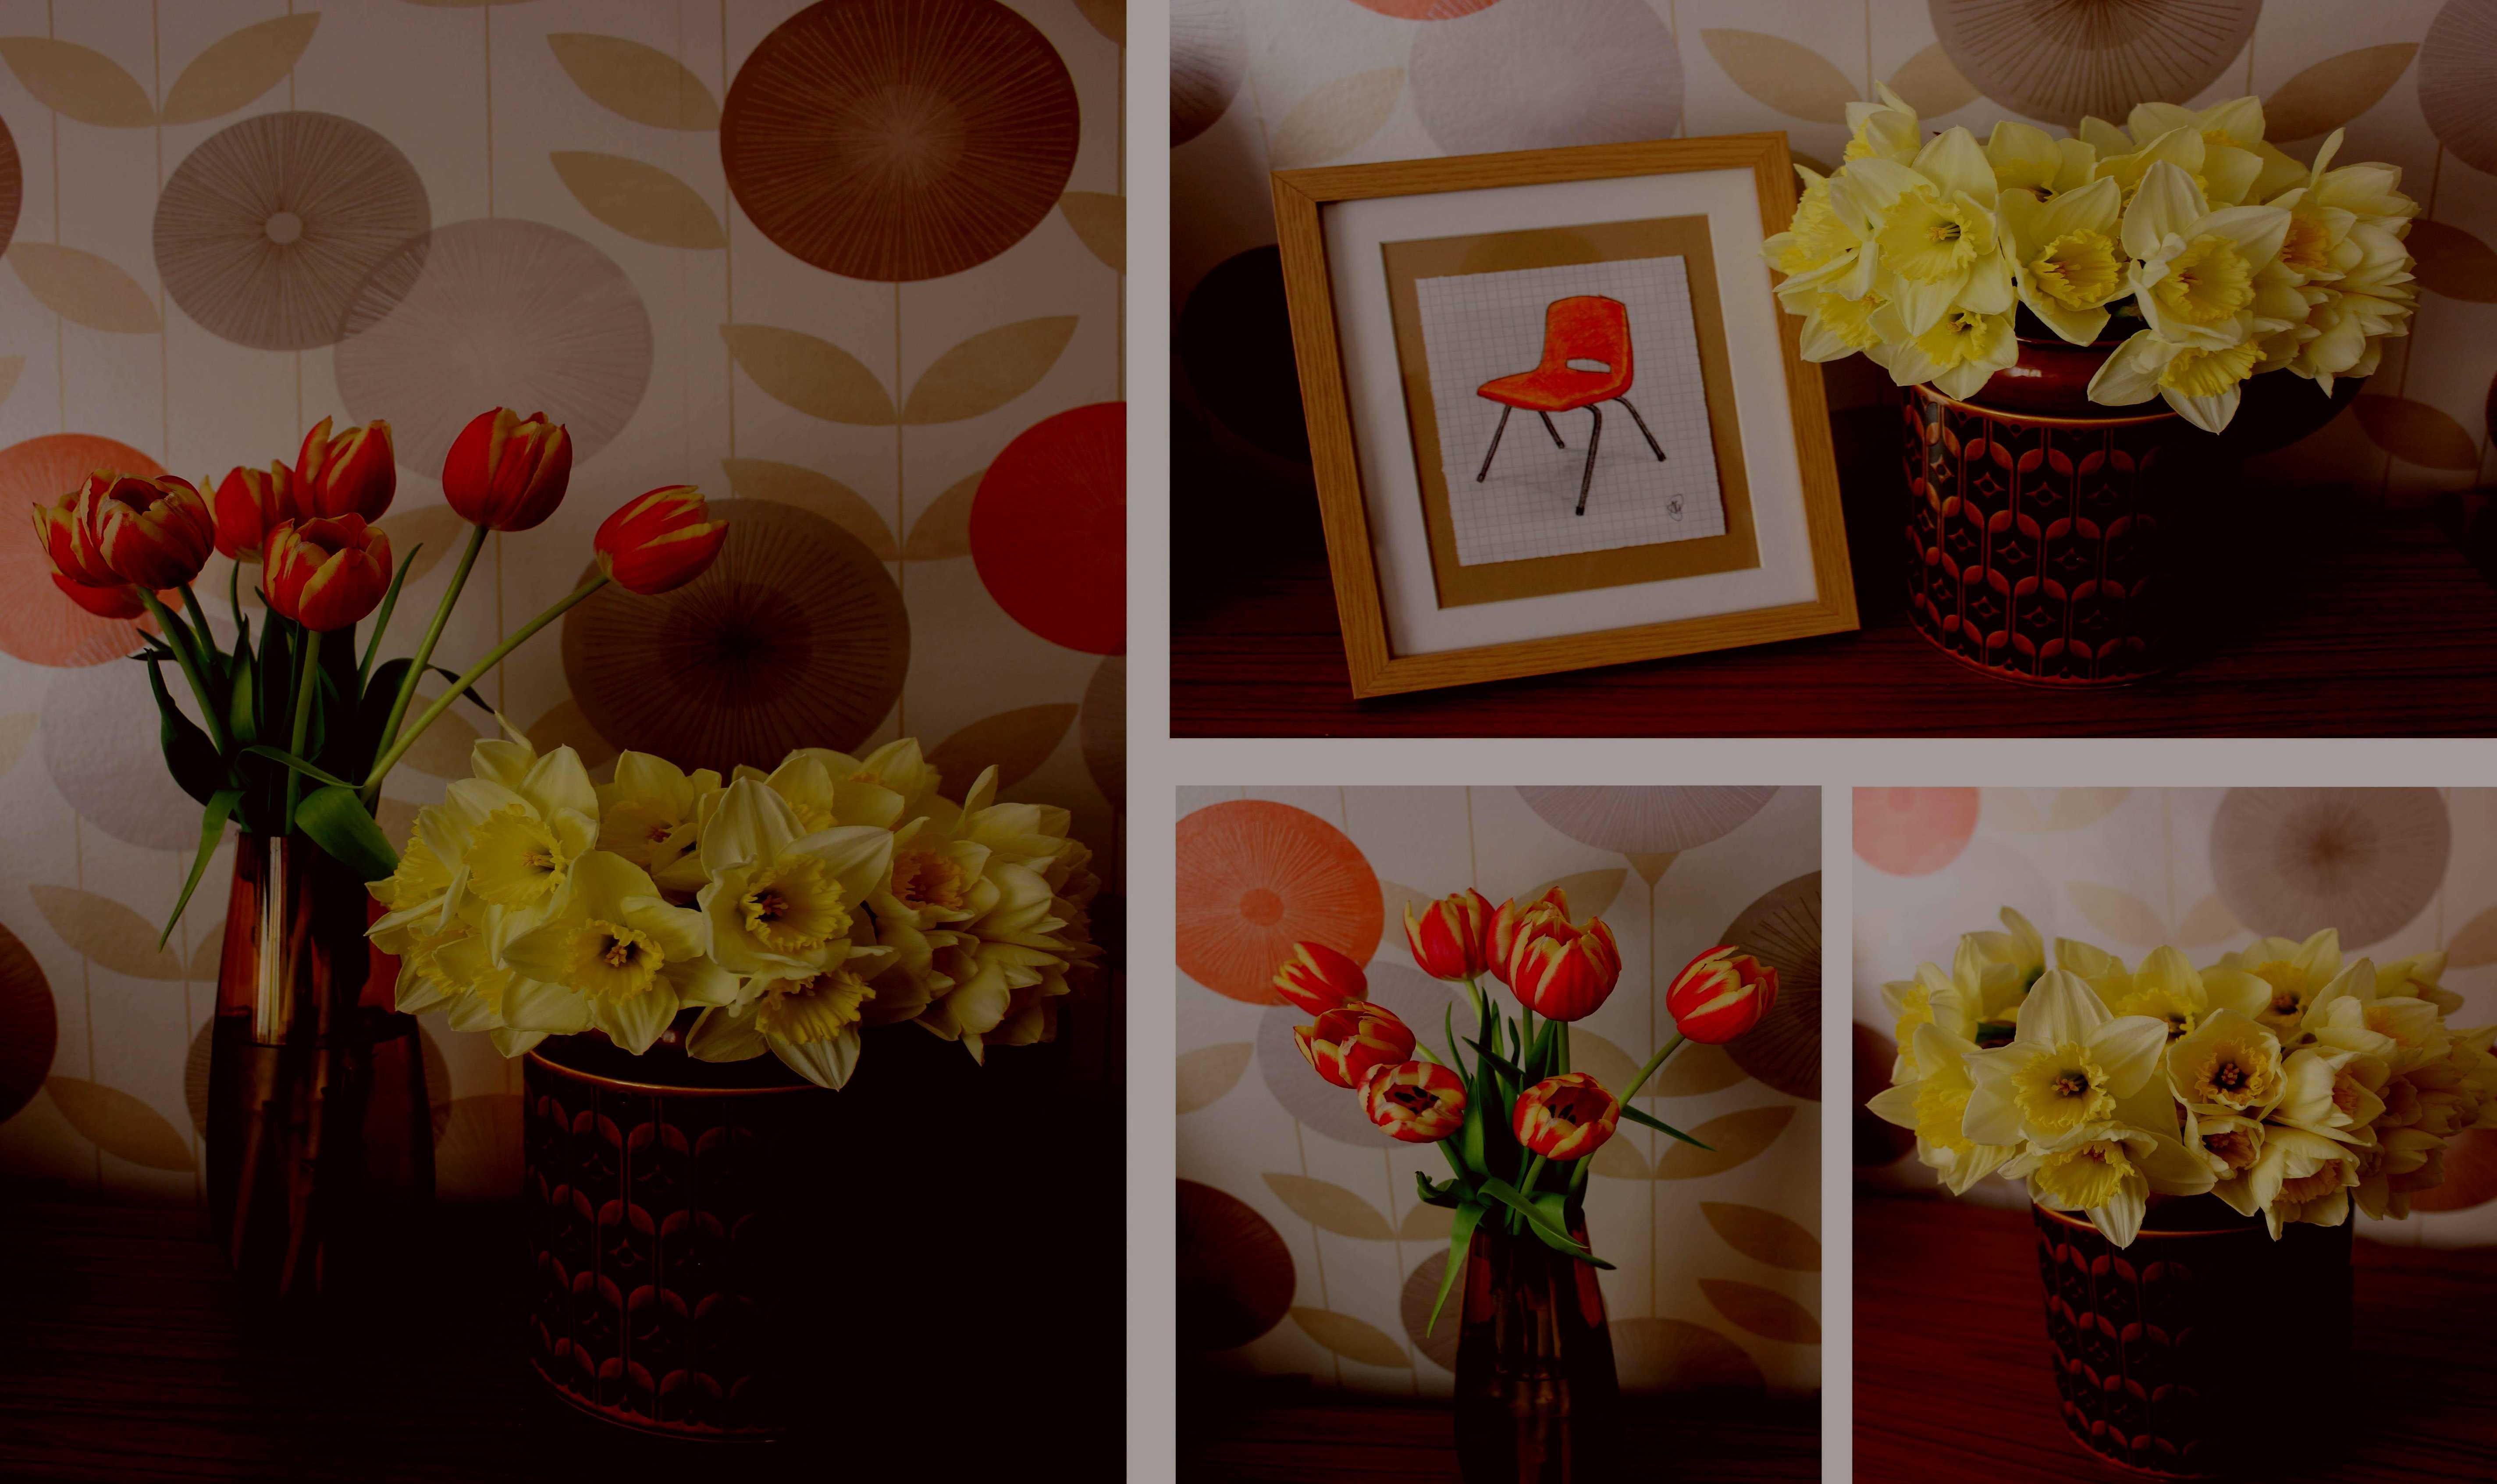 Diy Vase Decor Of Halloween Decoration Craft Ideas Diy Home Decor Vaseh Vases Inside Halloween Decoration Craft Ideas Diy Home Decor Vaseh Vases Decorative Flower Ideas I 0d Design Ideas